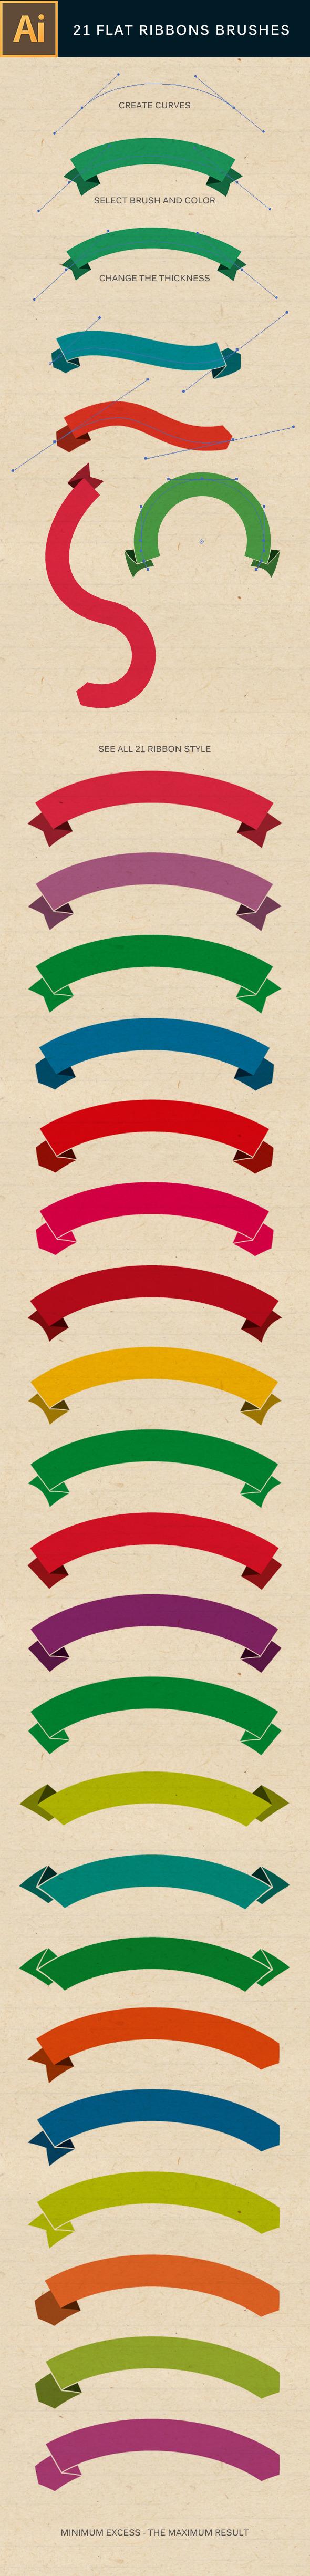 21 Flat Ribbons Brushes Set - Brushes Illustrator